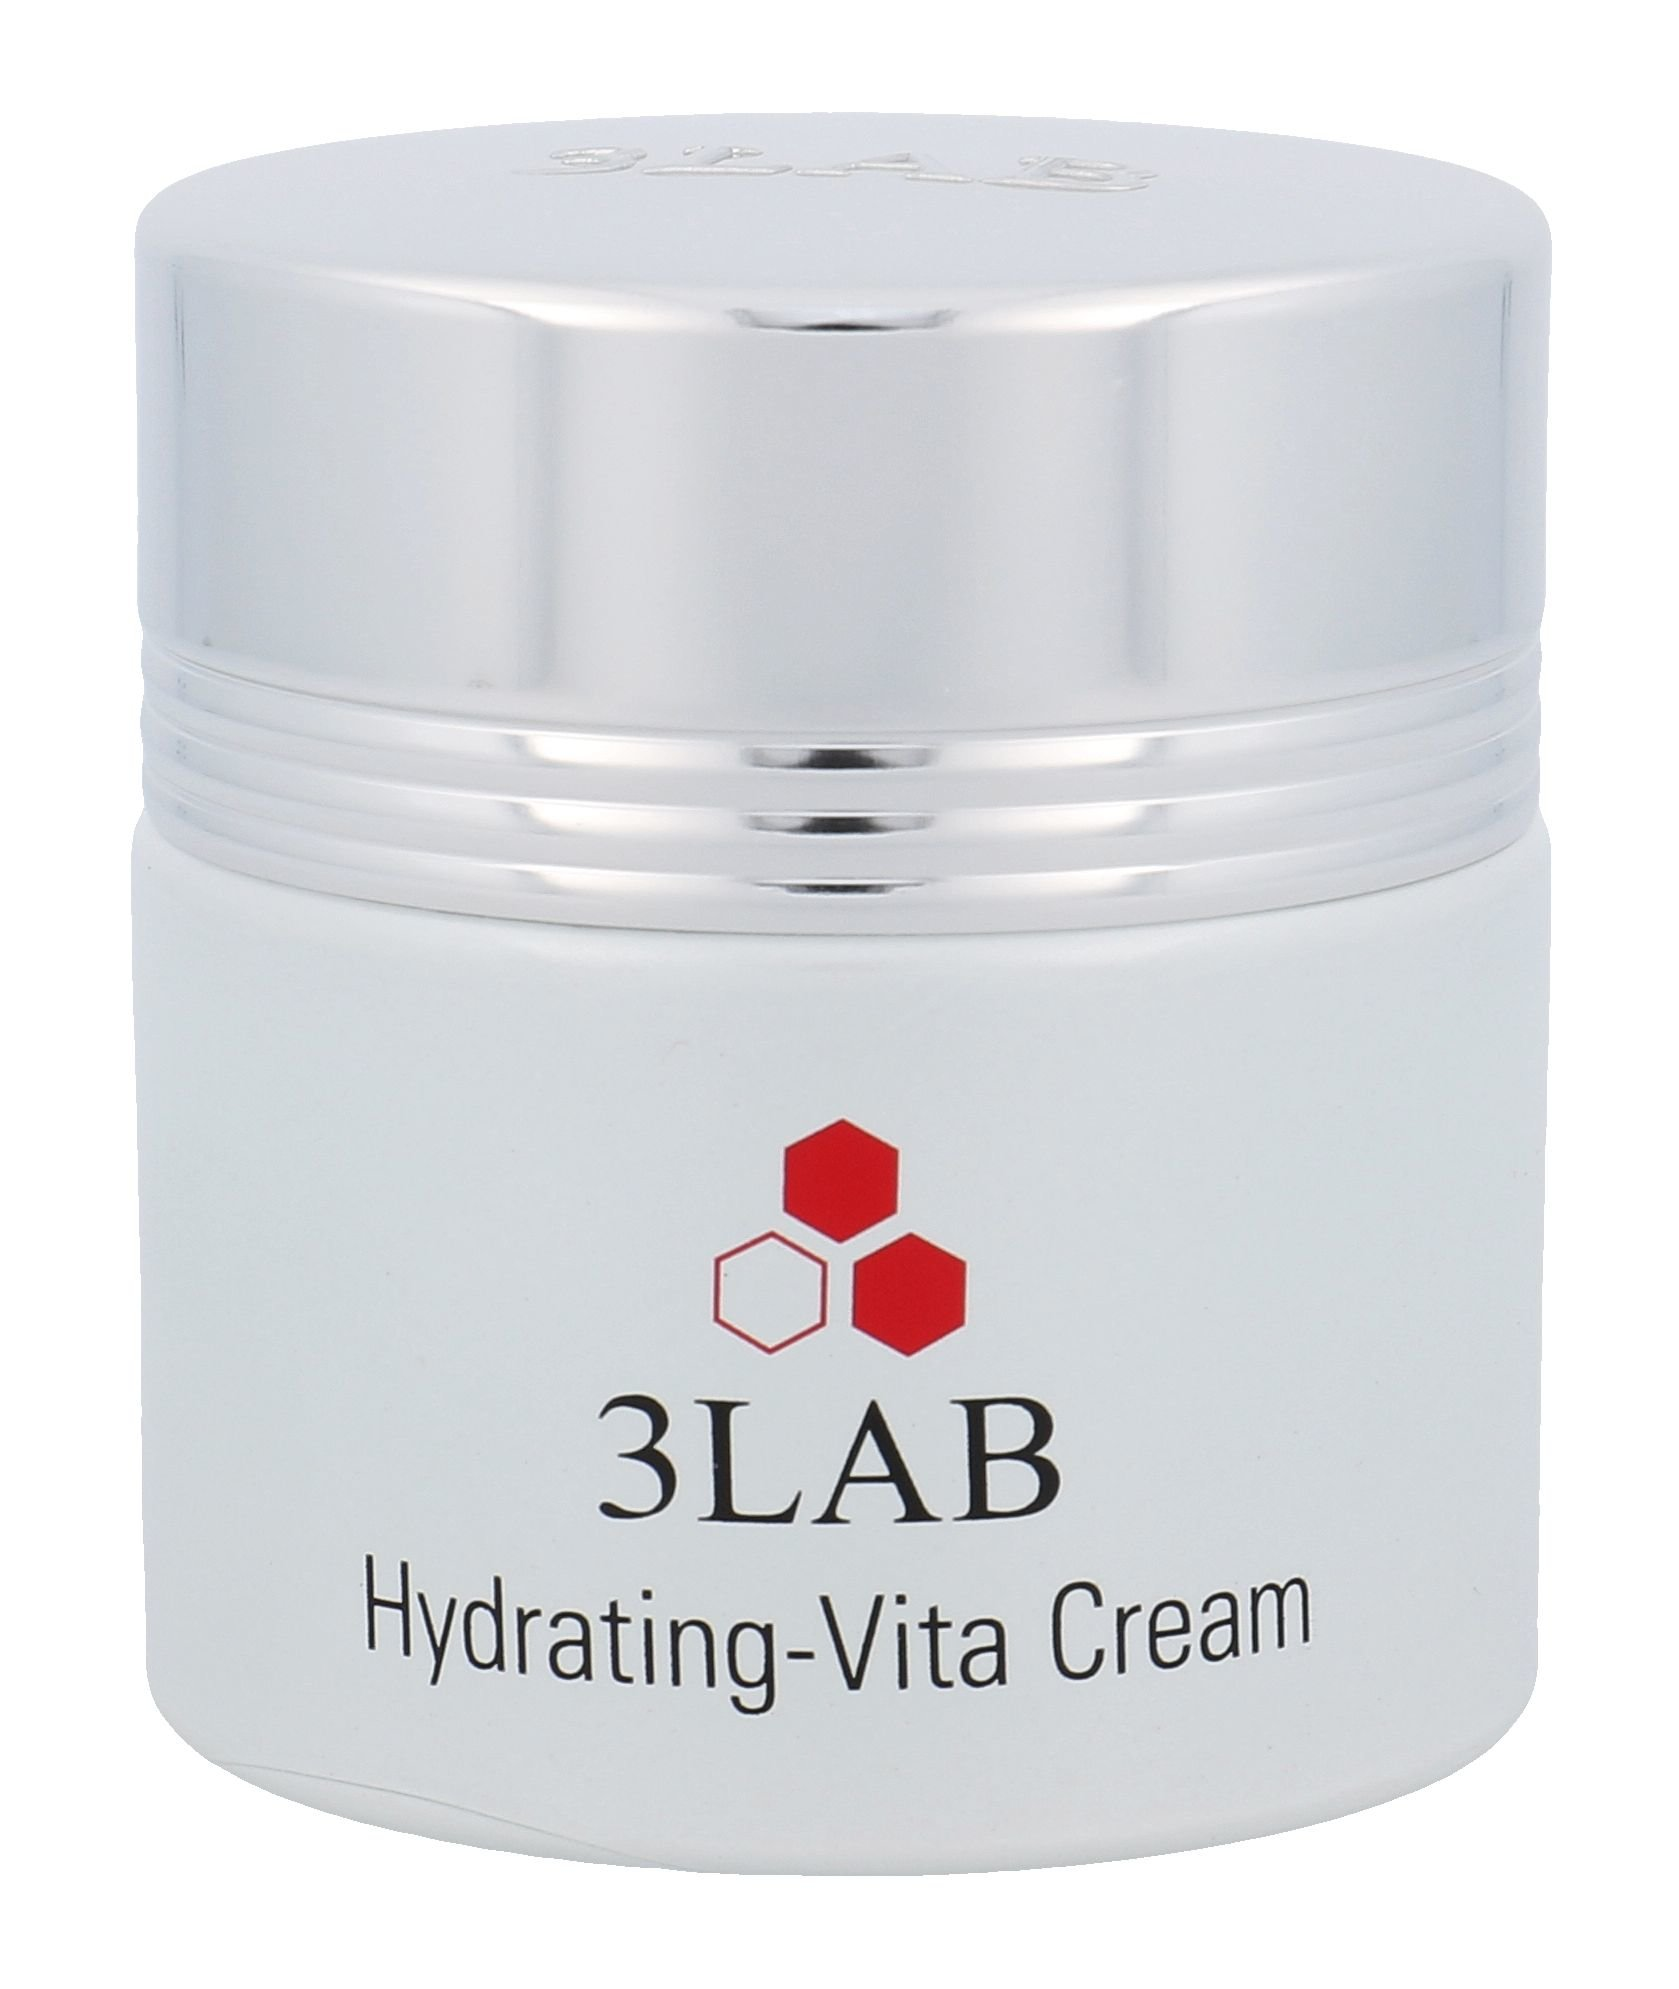 3LAB Hydrating-Vita Cream Cosmetic 60ml